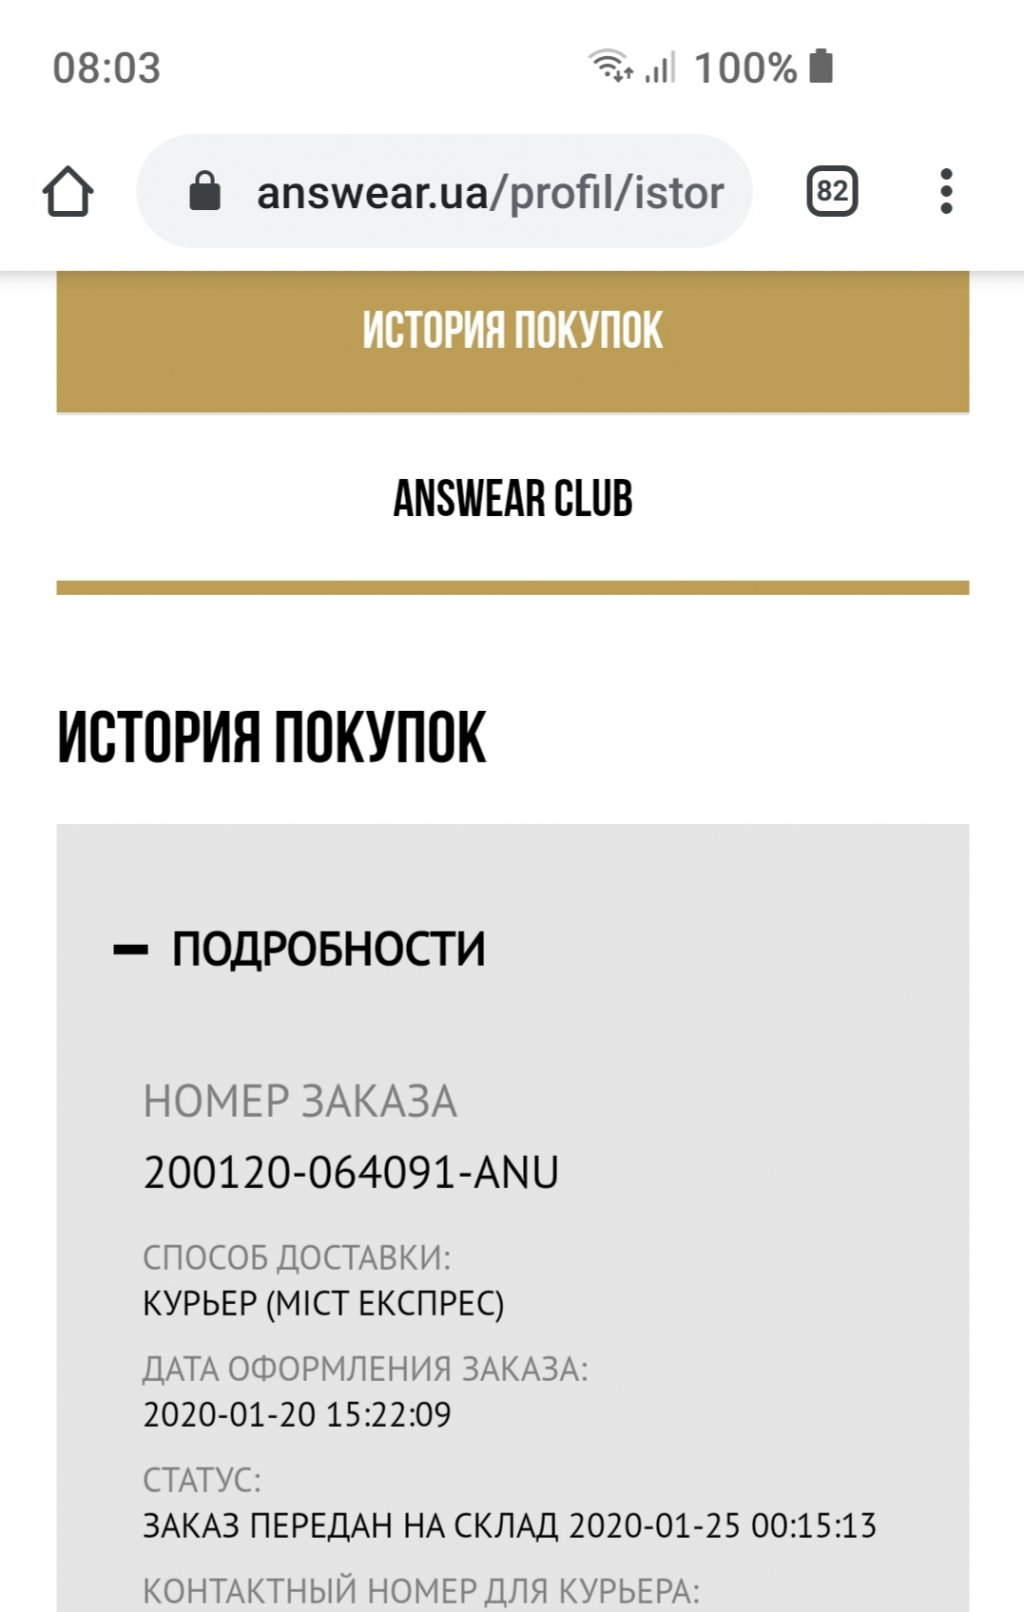 ANSWEAR.ua - Здравствуйте